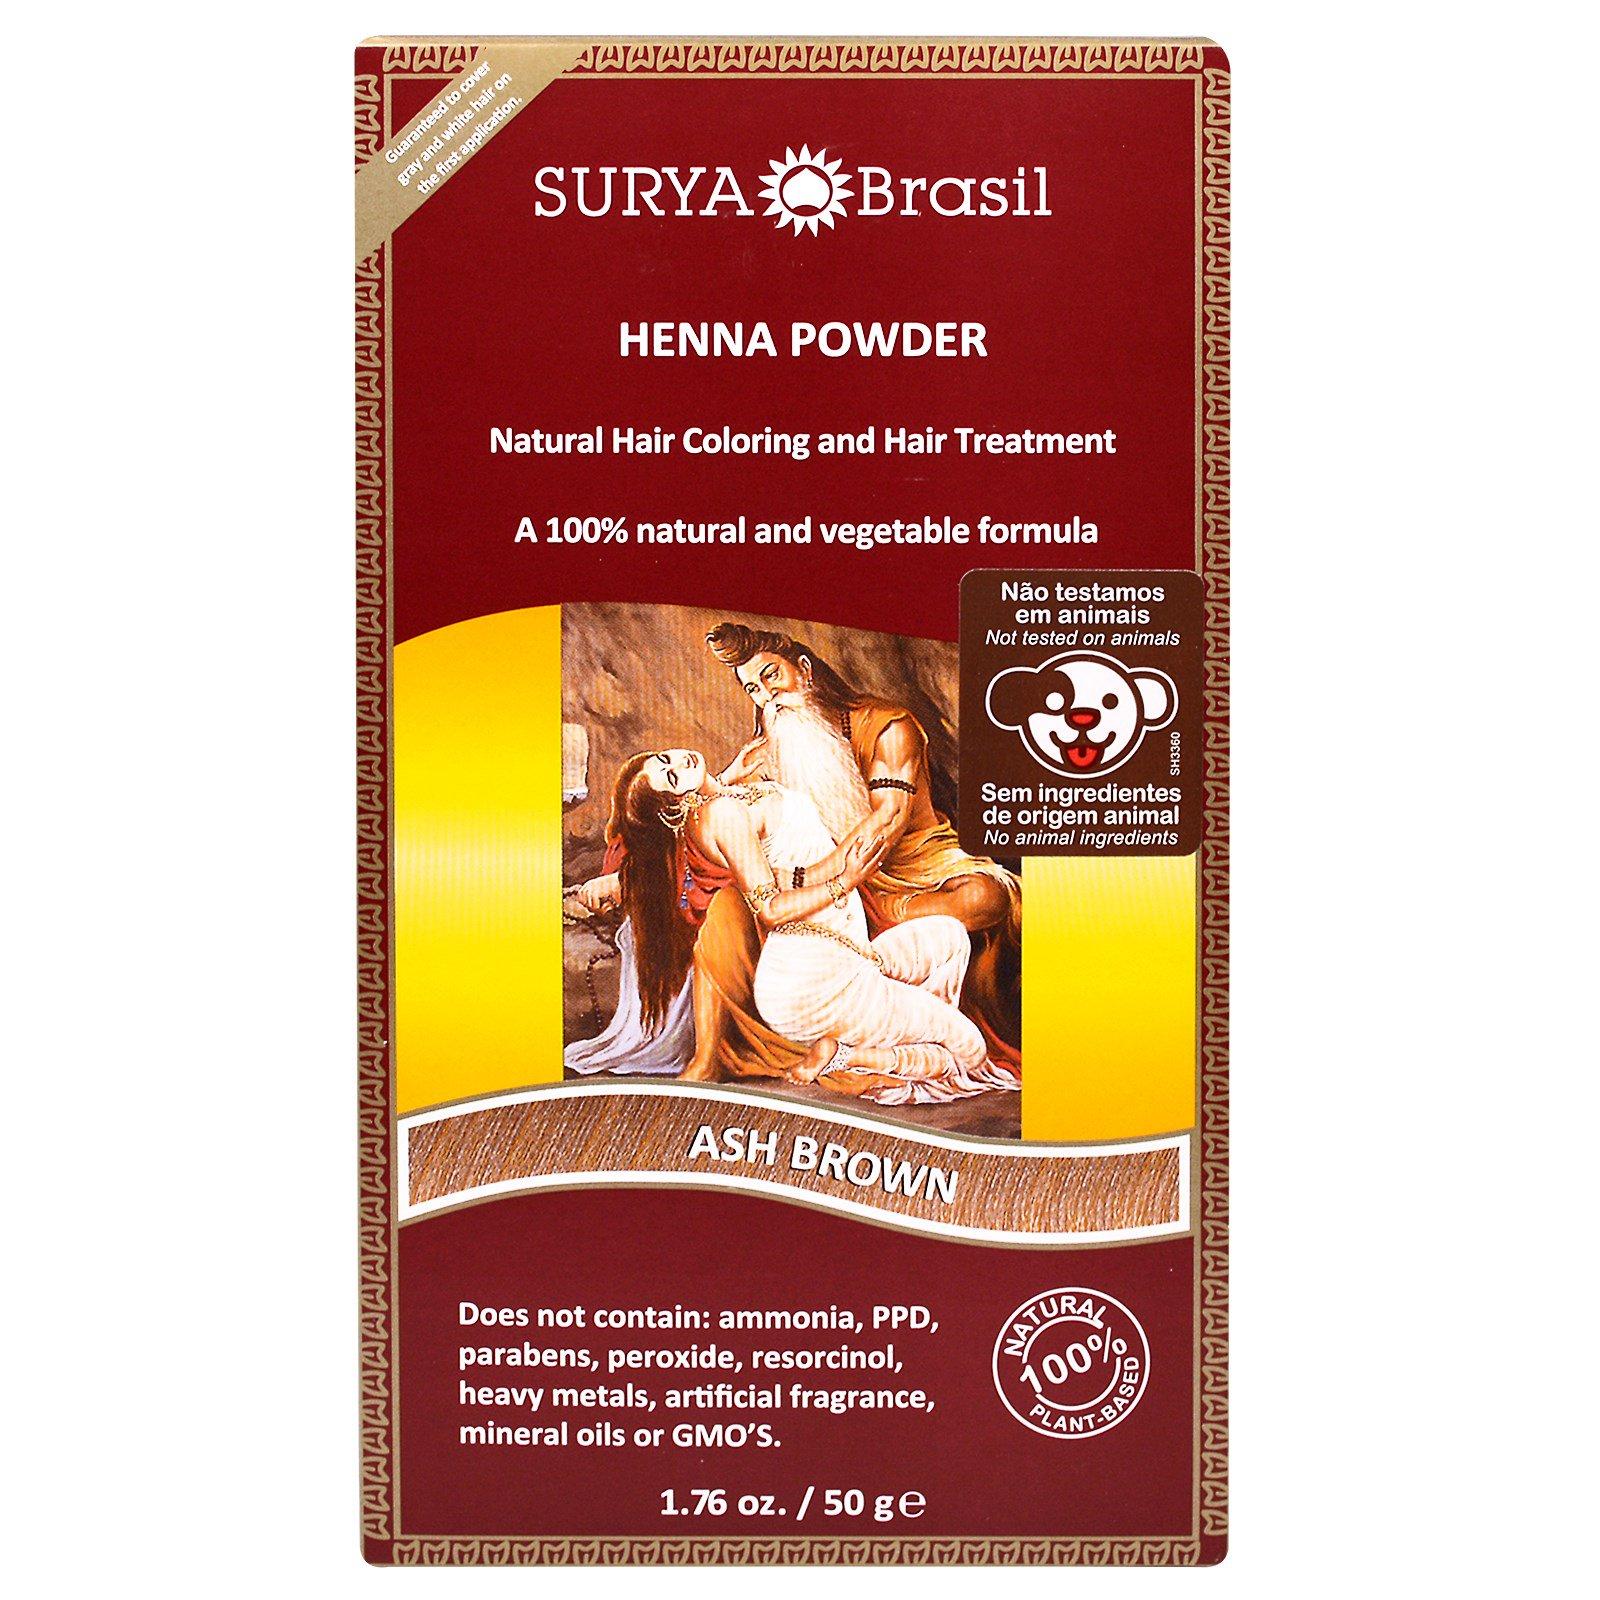 Surya Henna, Henna Brazil, Natural Hair Coloring and Hair Treatment Powder, Ash Brown, 1.76 oz (50 g)